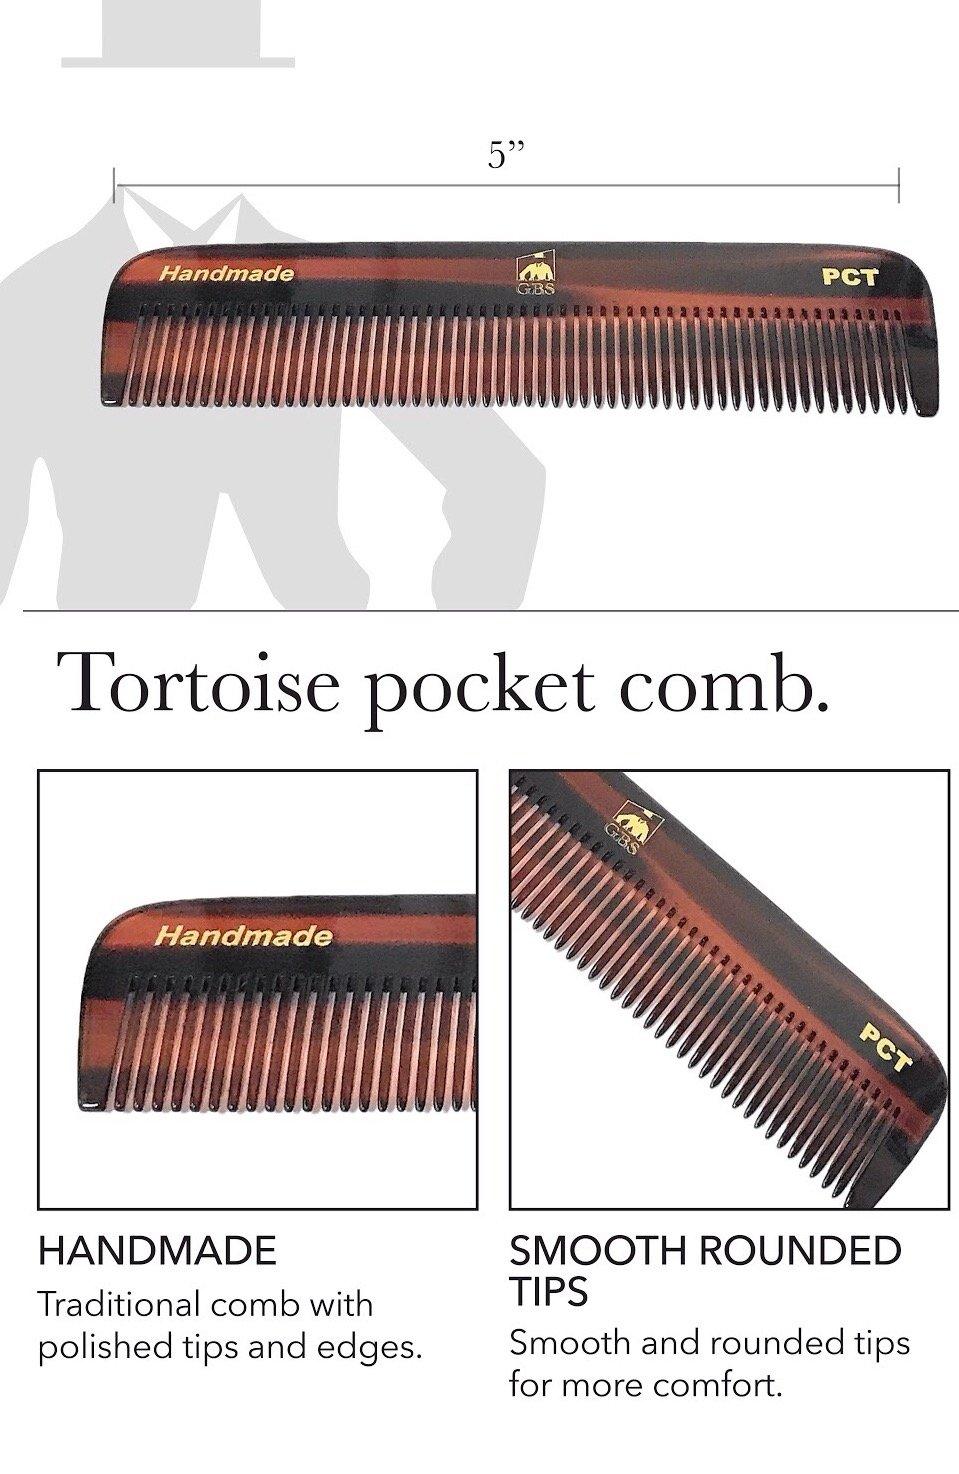 GBS Men's Handmade Anti-Static No Snag Sawcut Teeth Grooming Hair and Beard Comb Set - Dressing Head Comb, All Purpose Folding Comb, Pocket Comb, Mustache Comb All Hair Styles